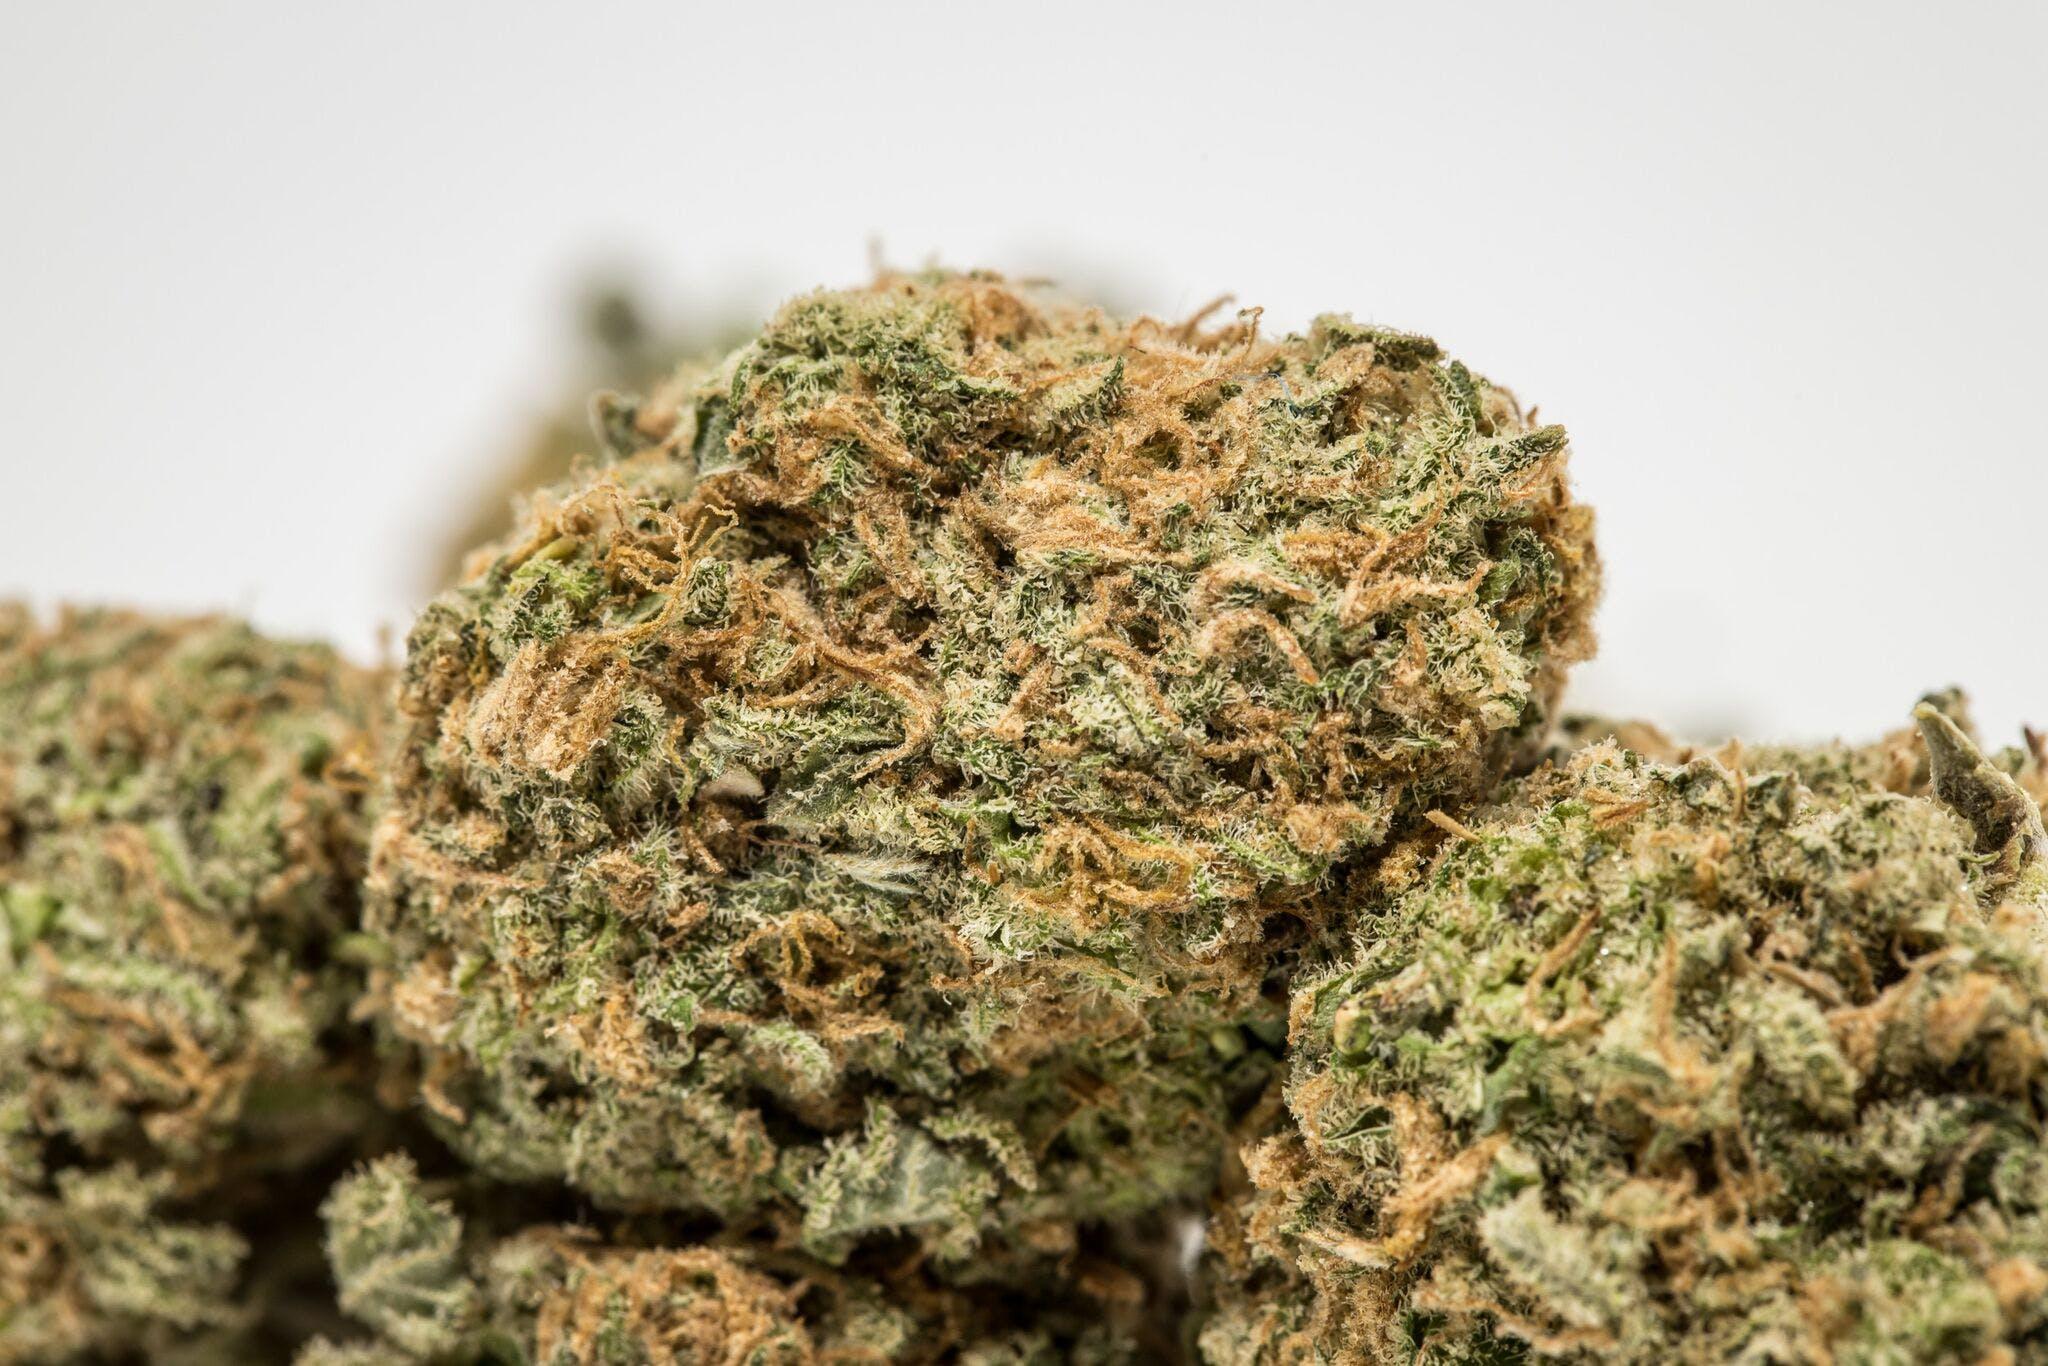 Cookies Kush Weed; Cookies Kush Cannabis Strain; Cookies Kush Indica Marijuana Strain